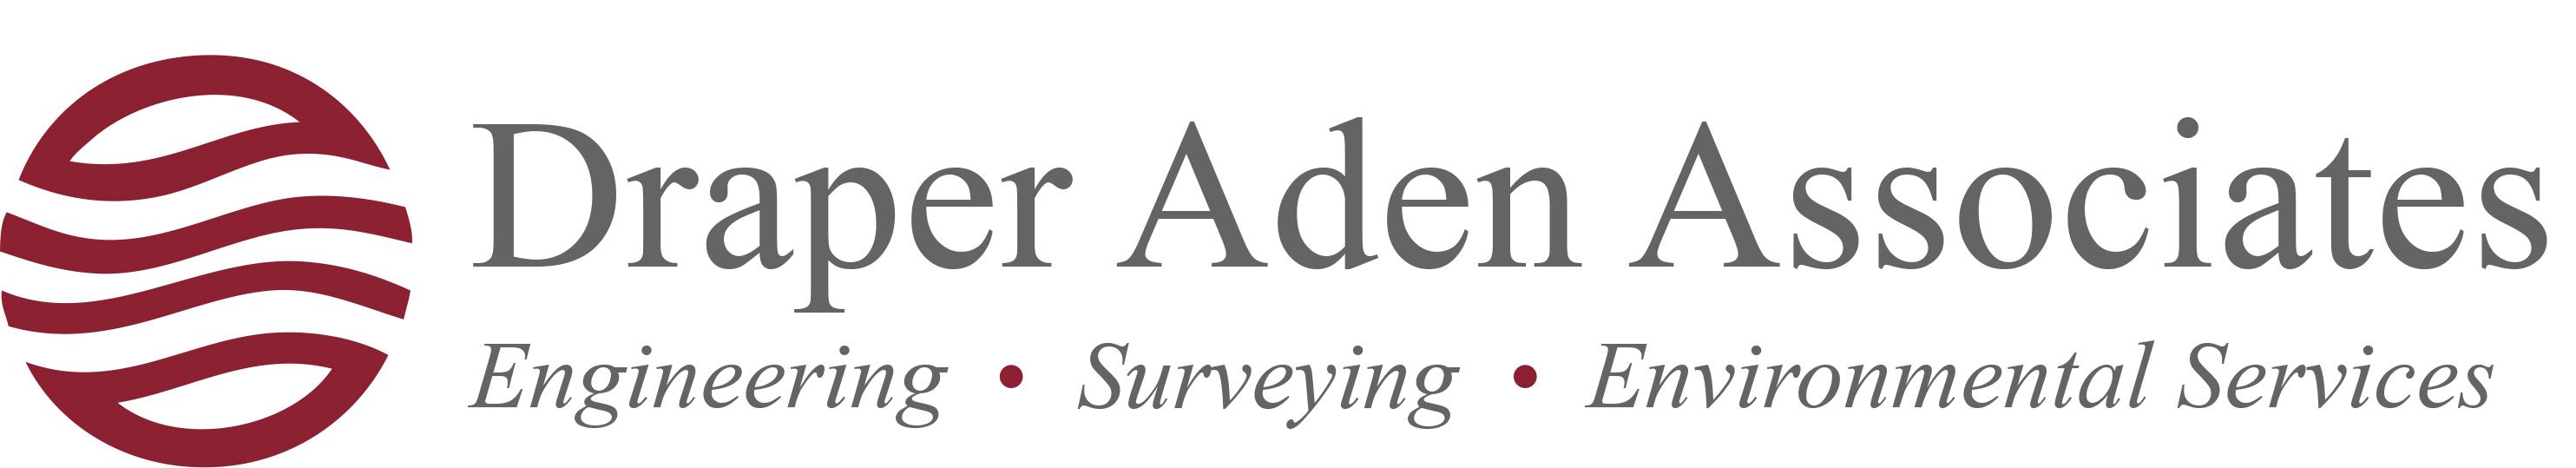 Investor of the Week | Draper Aden Associates